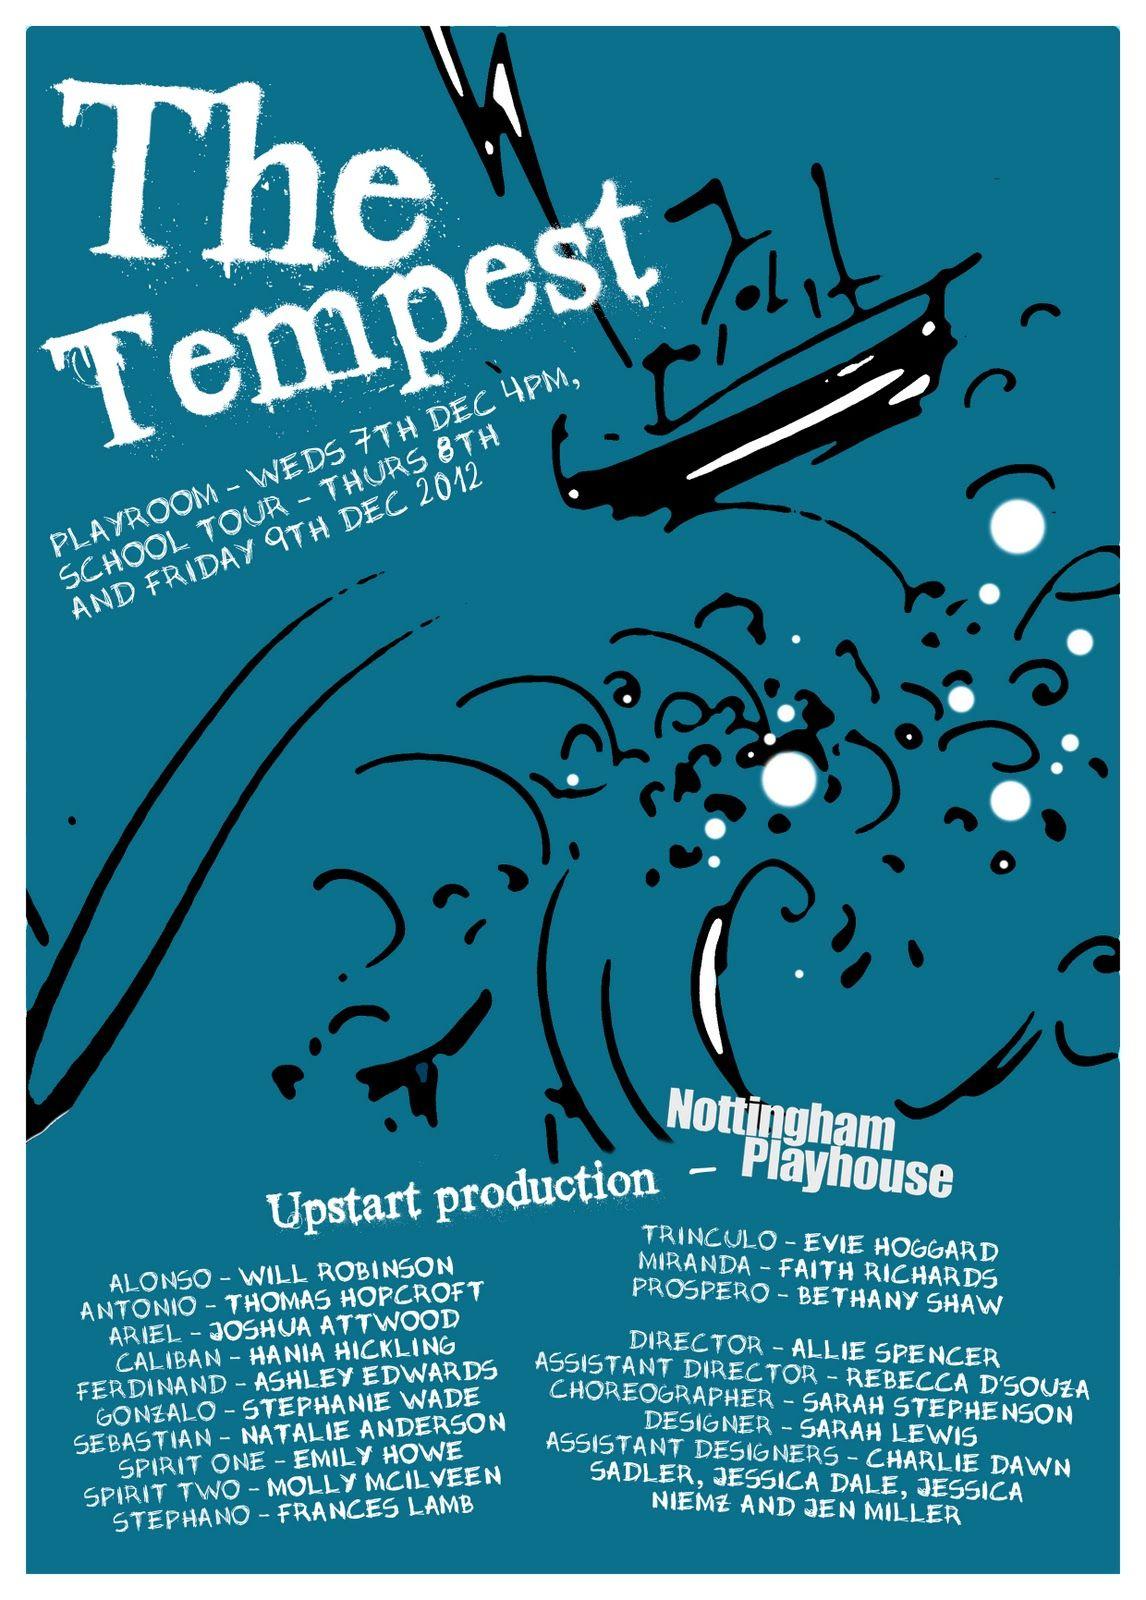 Poster design maker - My Poster Design For The Tempest Upstart Production I Ve Just Designed At The Nottingham Playhouse